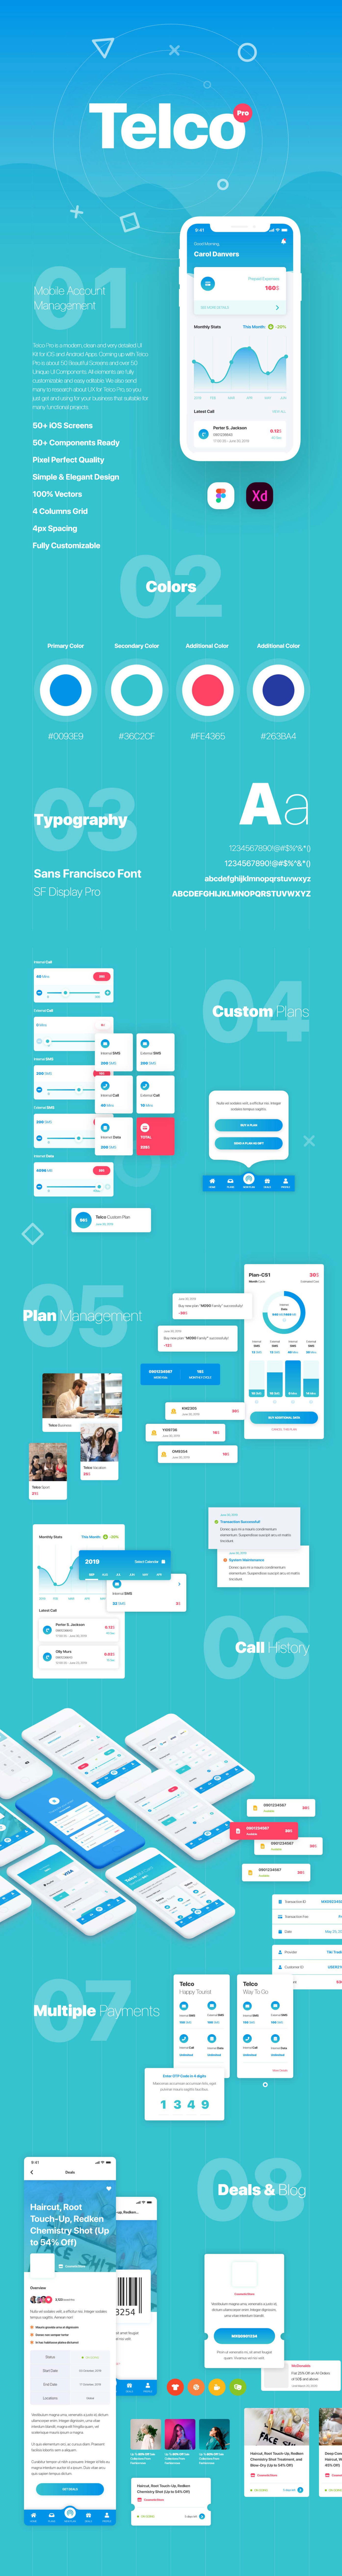 专业的大数据仪表盘后台管理APP UI 套装 app设计iOS Ui下载[XD,fig] Telco Pro Mobile Management App